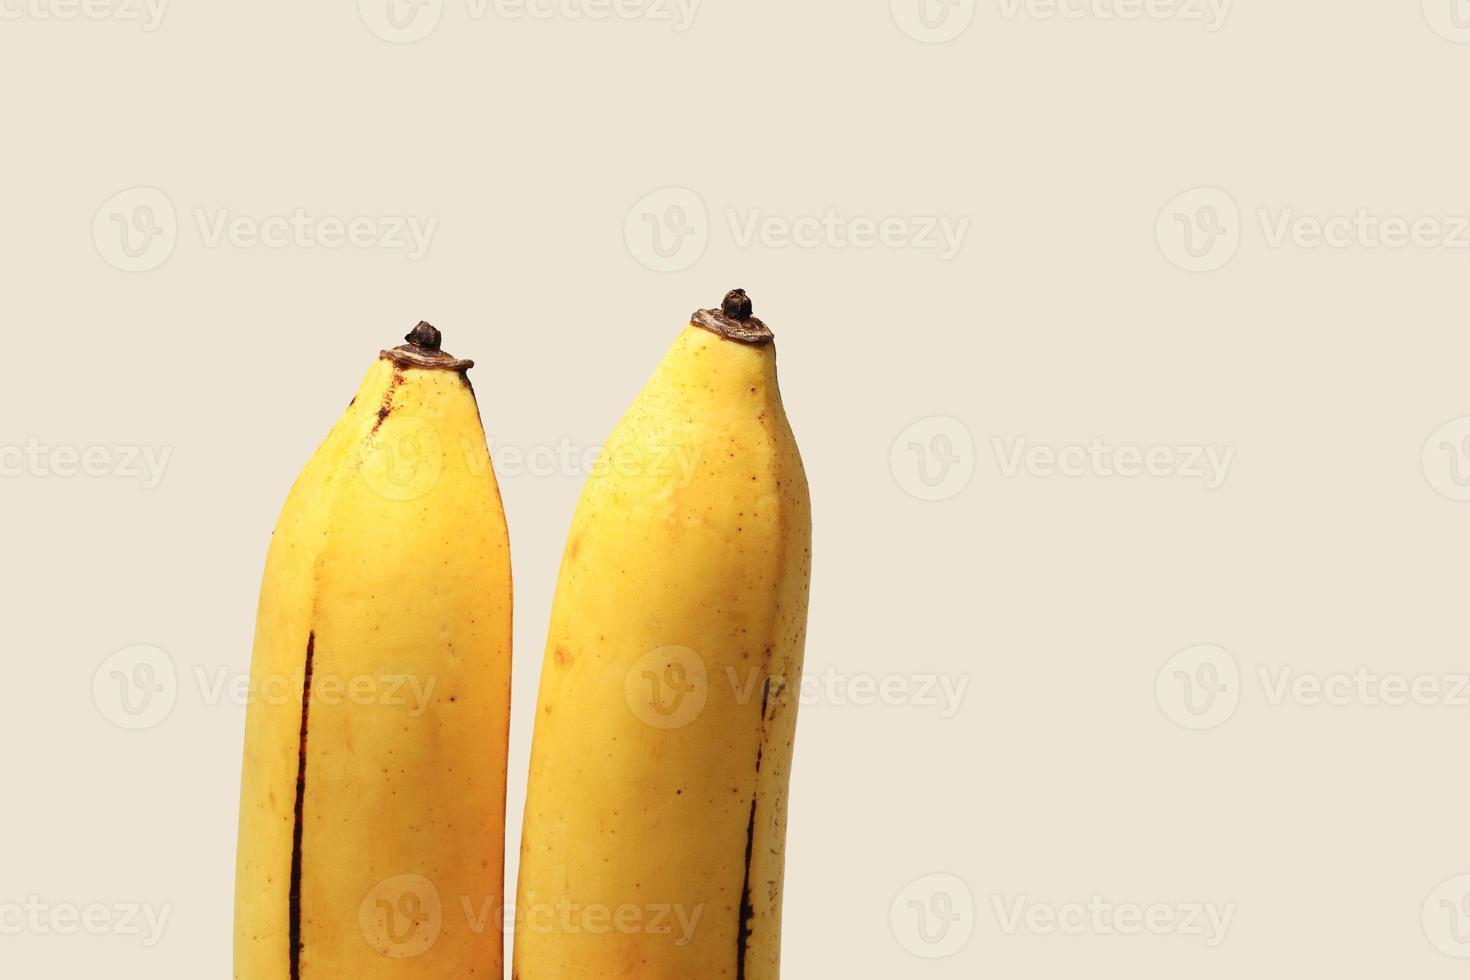 Two bananas isolated on cream background photo